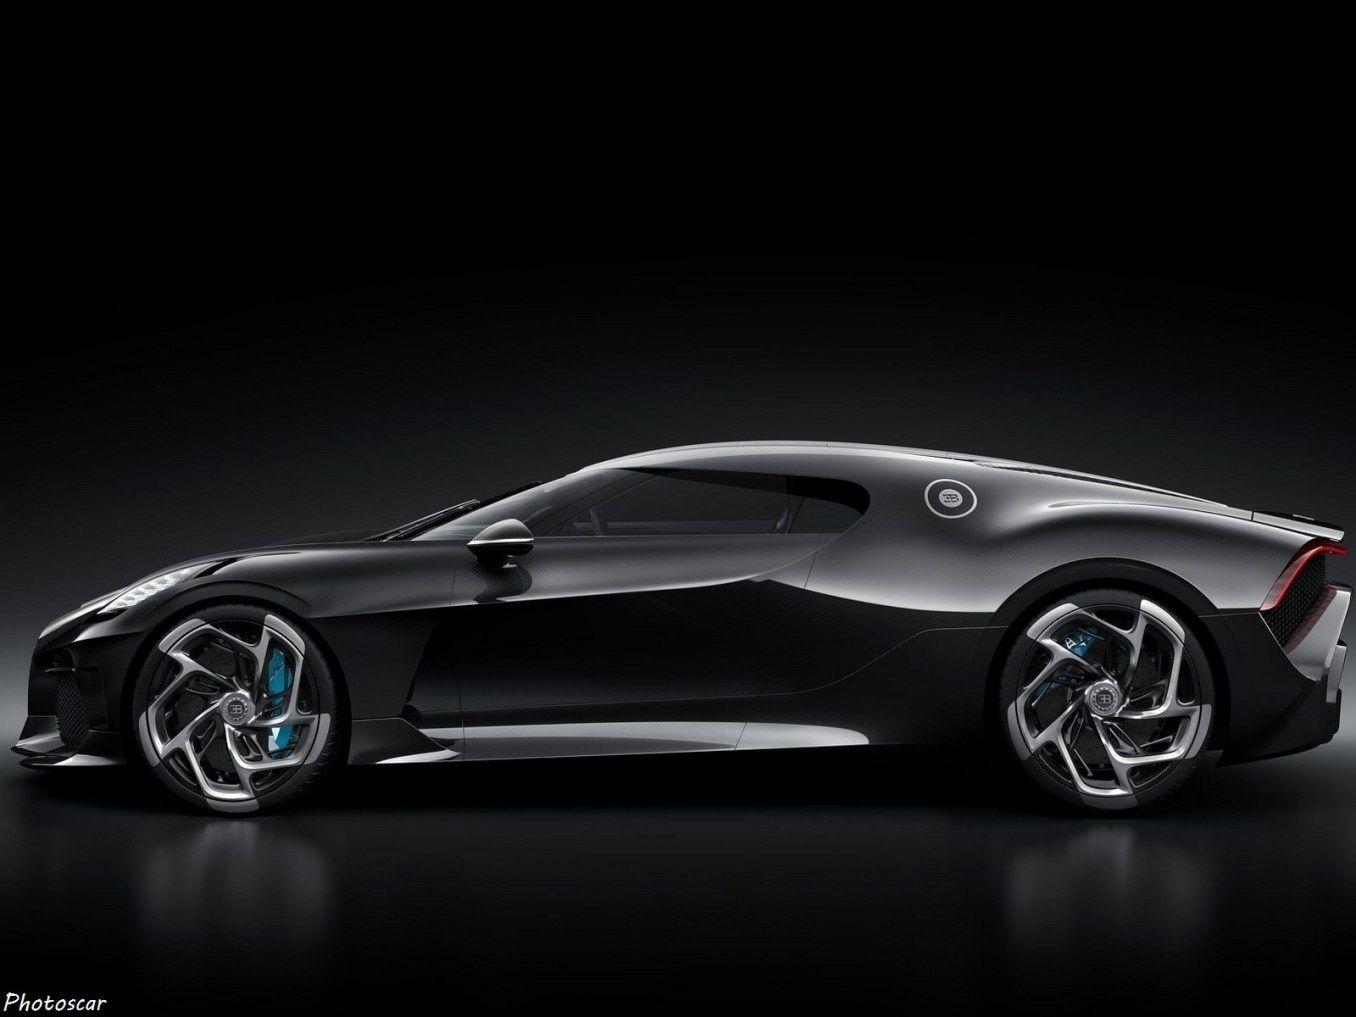 Download 2019 Bugatti La Voiture Noire Luxury Car